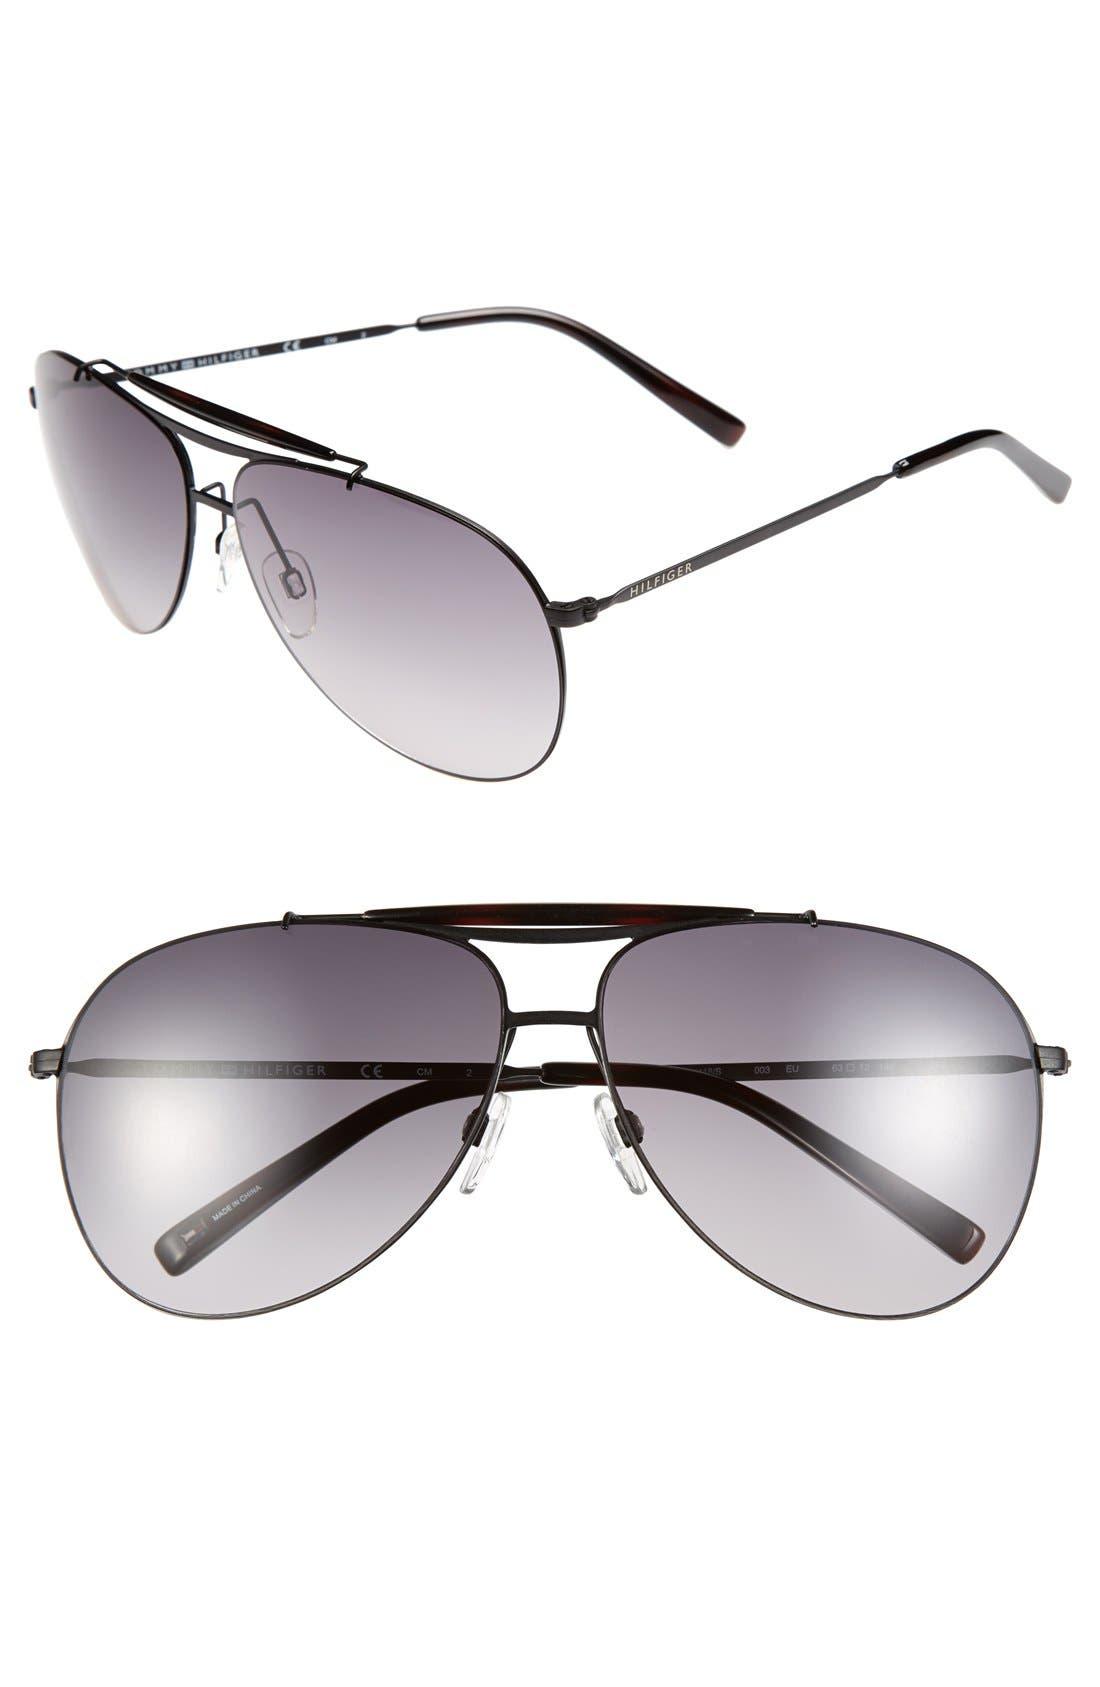 Main Image - Tommy Hilfiger 63mm Aviator Sunglasses